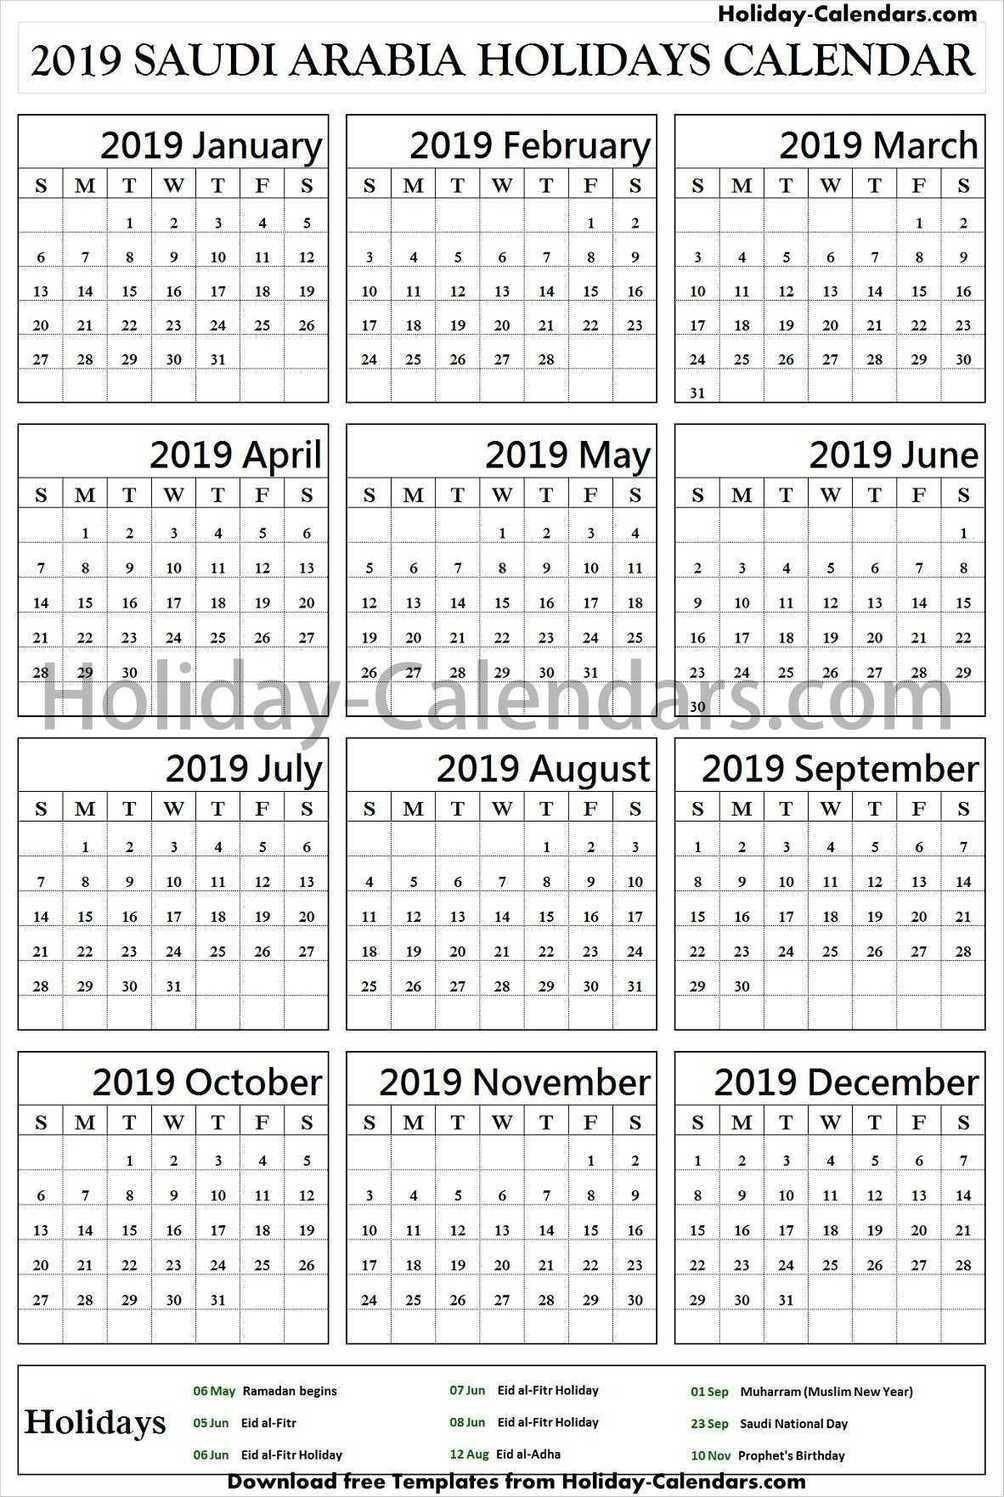 Pin By Holiday Calendars On Holidays Calendar 2019 | Bank-Saudi Bank Holidays 2020